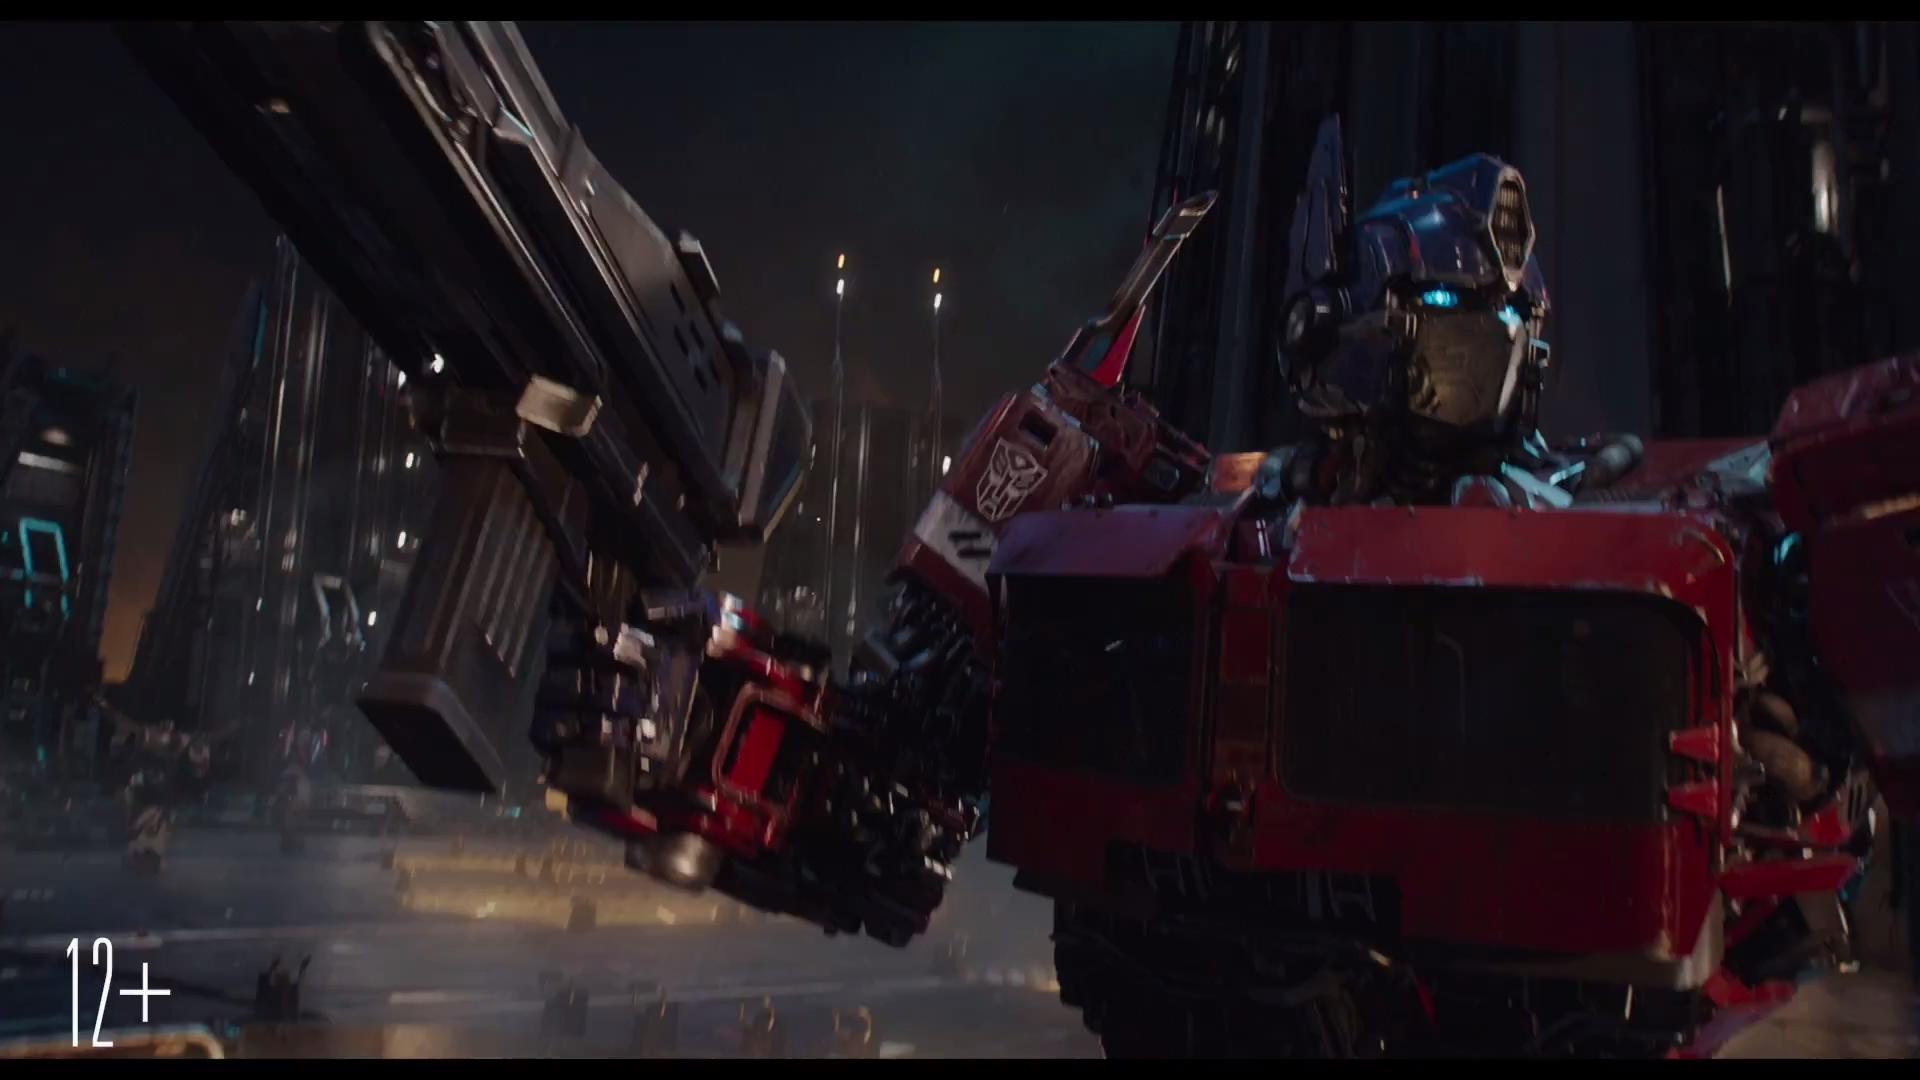 transformers: bumblebee movie trailer #3 hd screen caps - cybertron